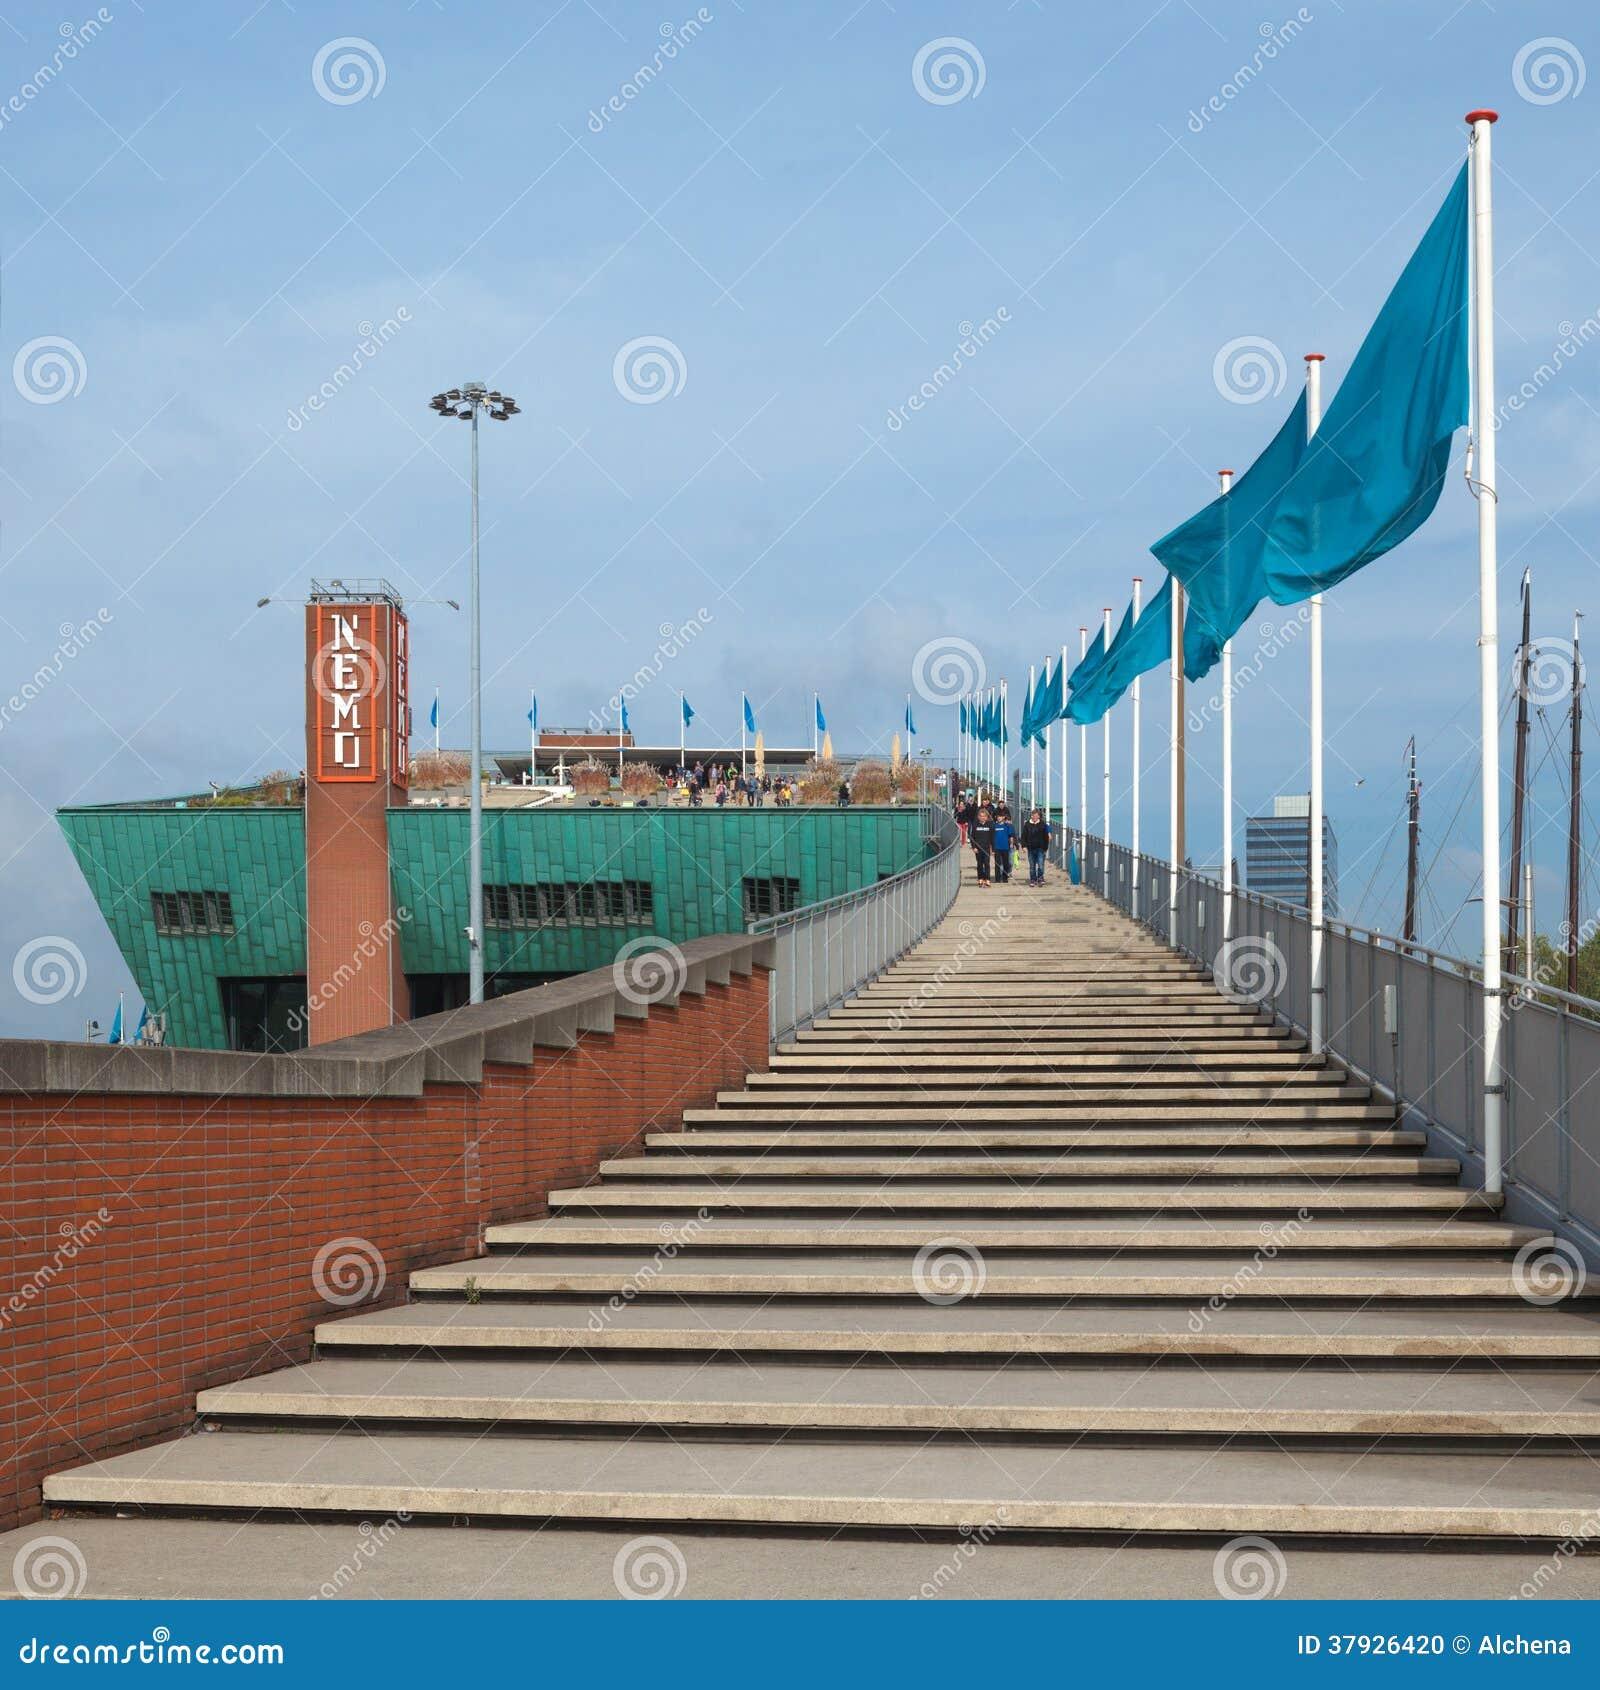 The Nemo Museum Terrace In Amsterdam Netherlands